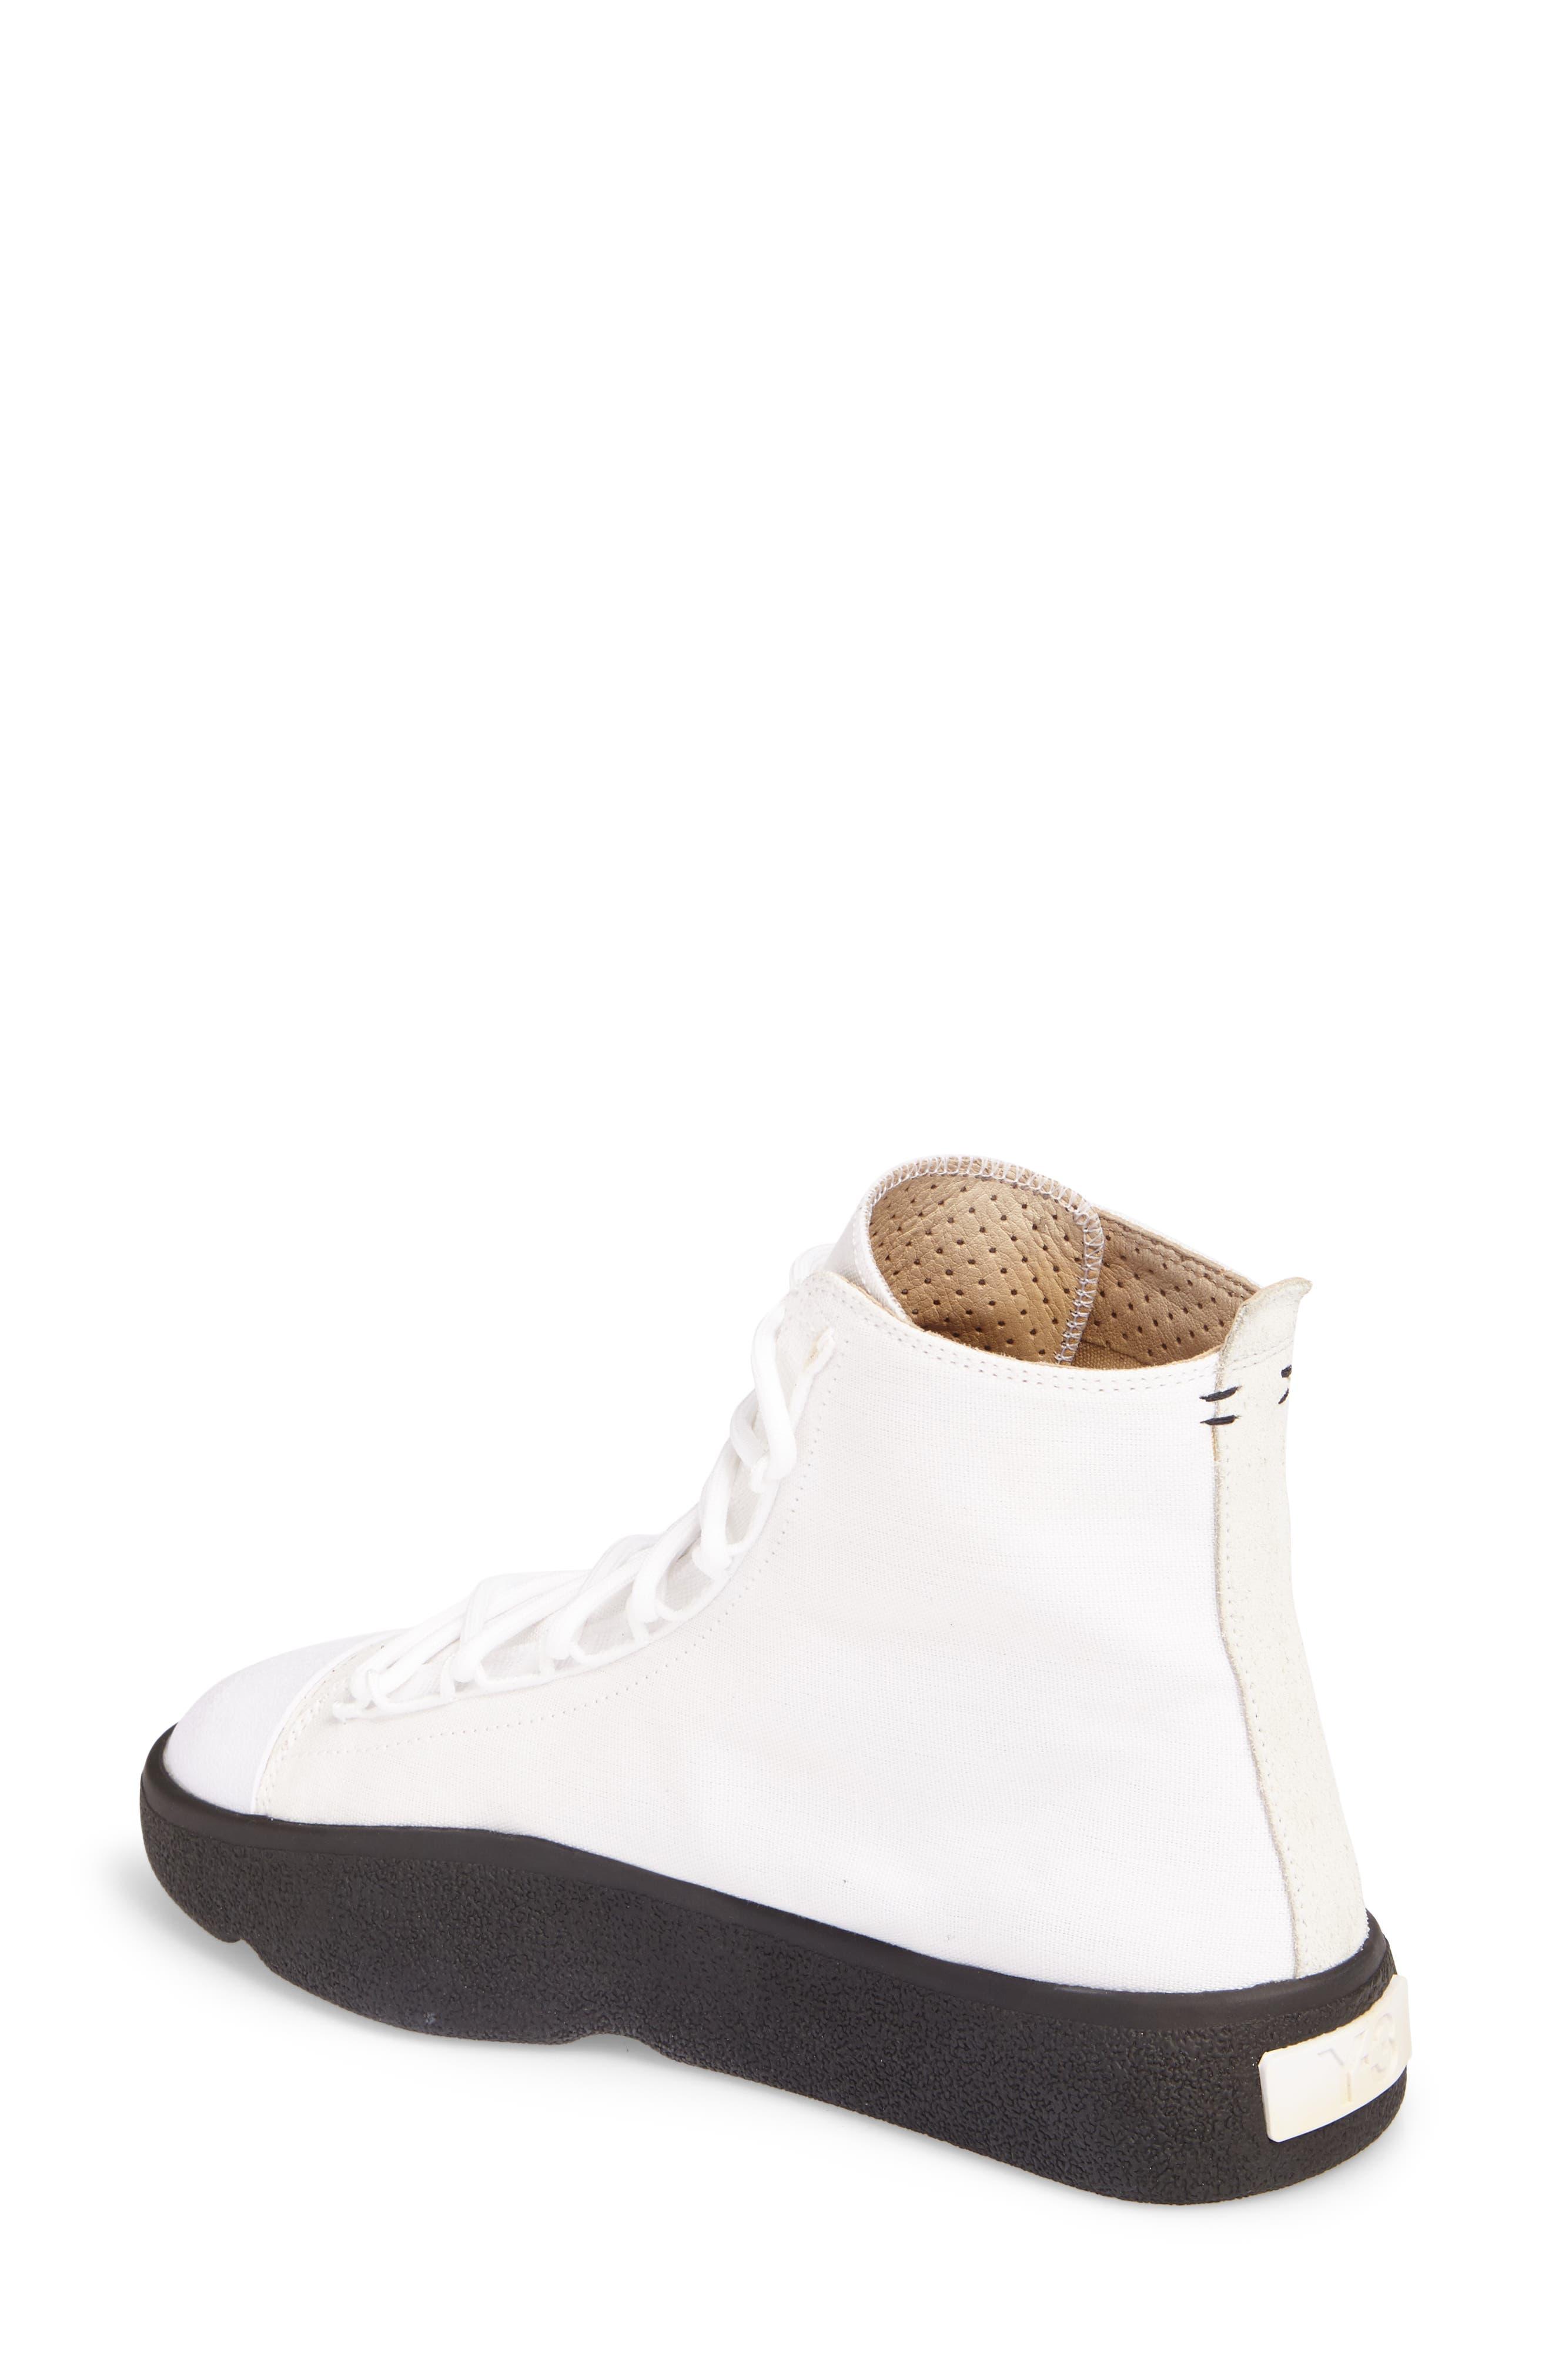 Bashyo High Top Sneaker,                             Alternate thumbnail 2, color,                             100